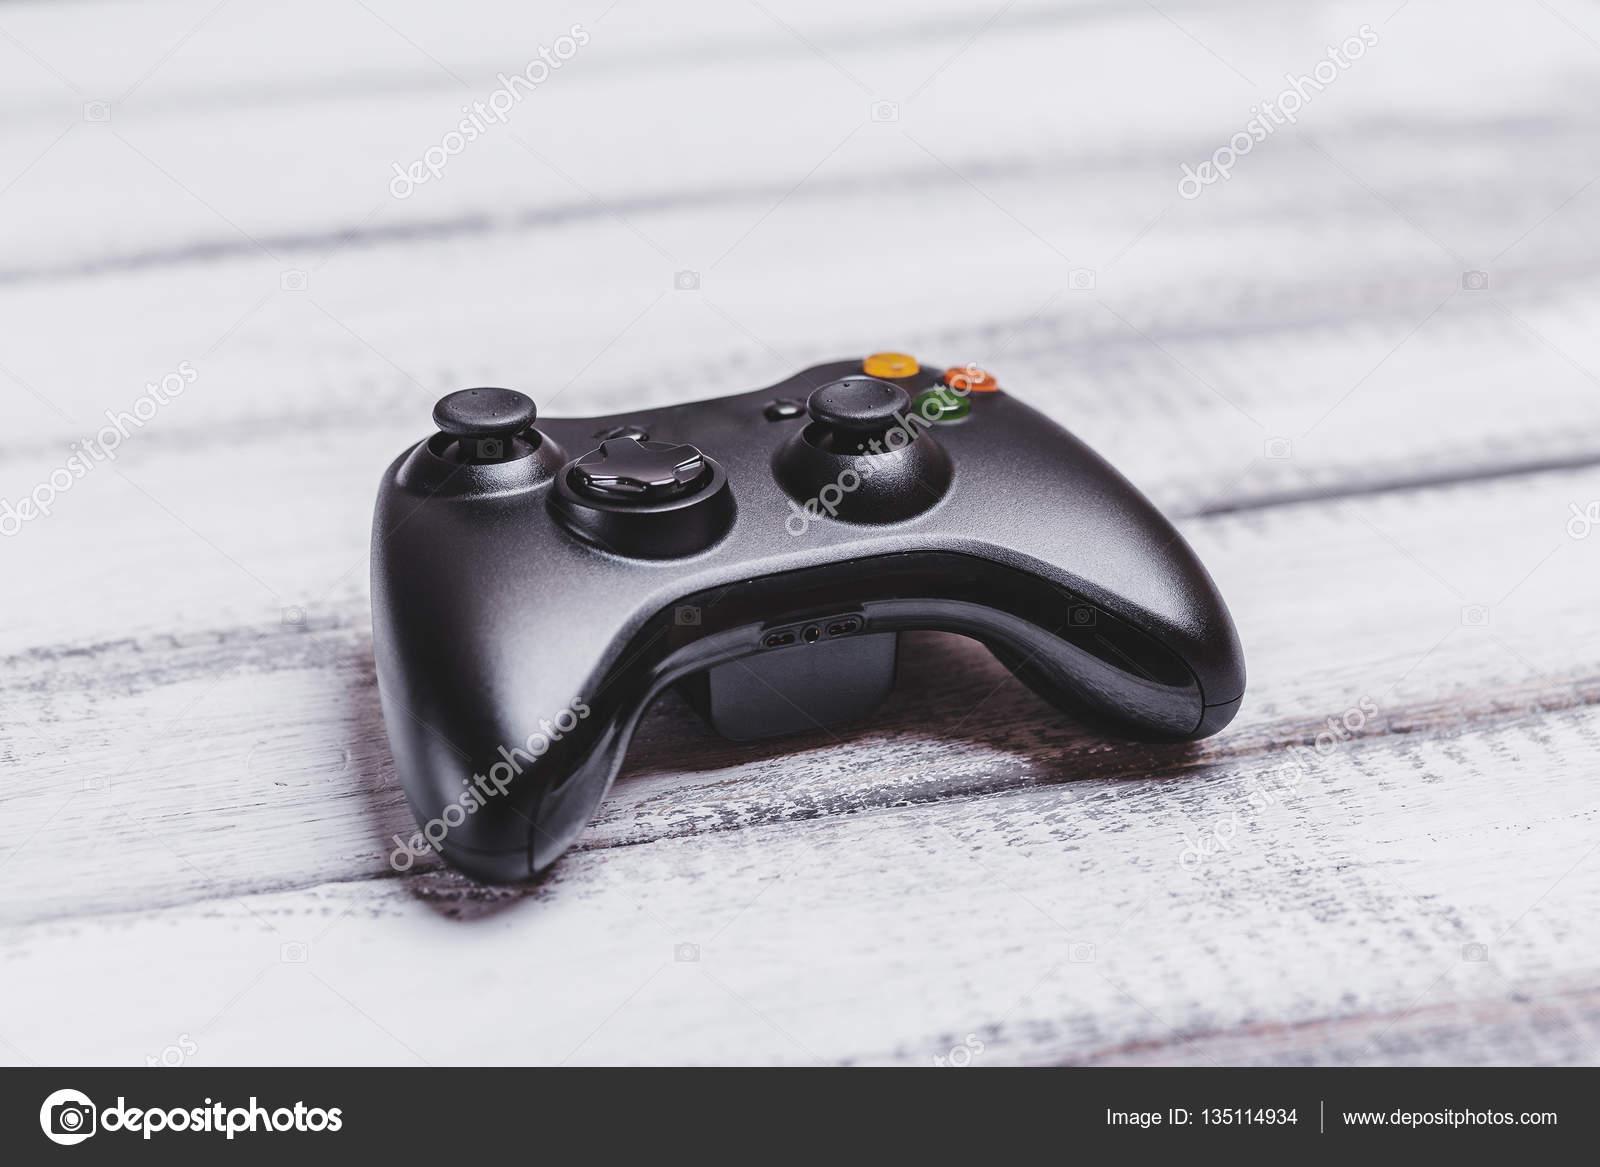 Imagenes Xbox 360 Controlador Gamepad O Juego Wireless Negro Para